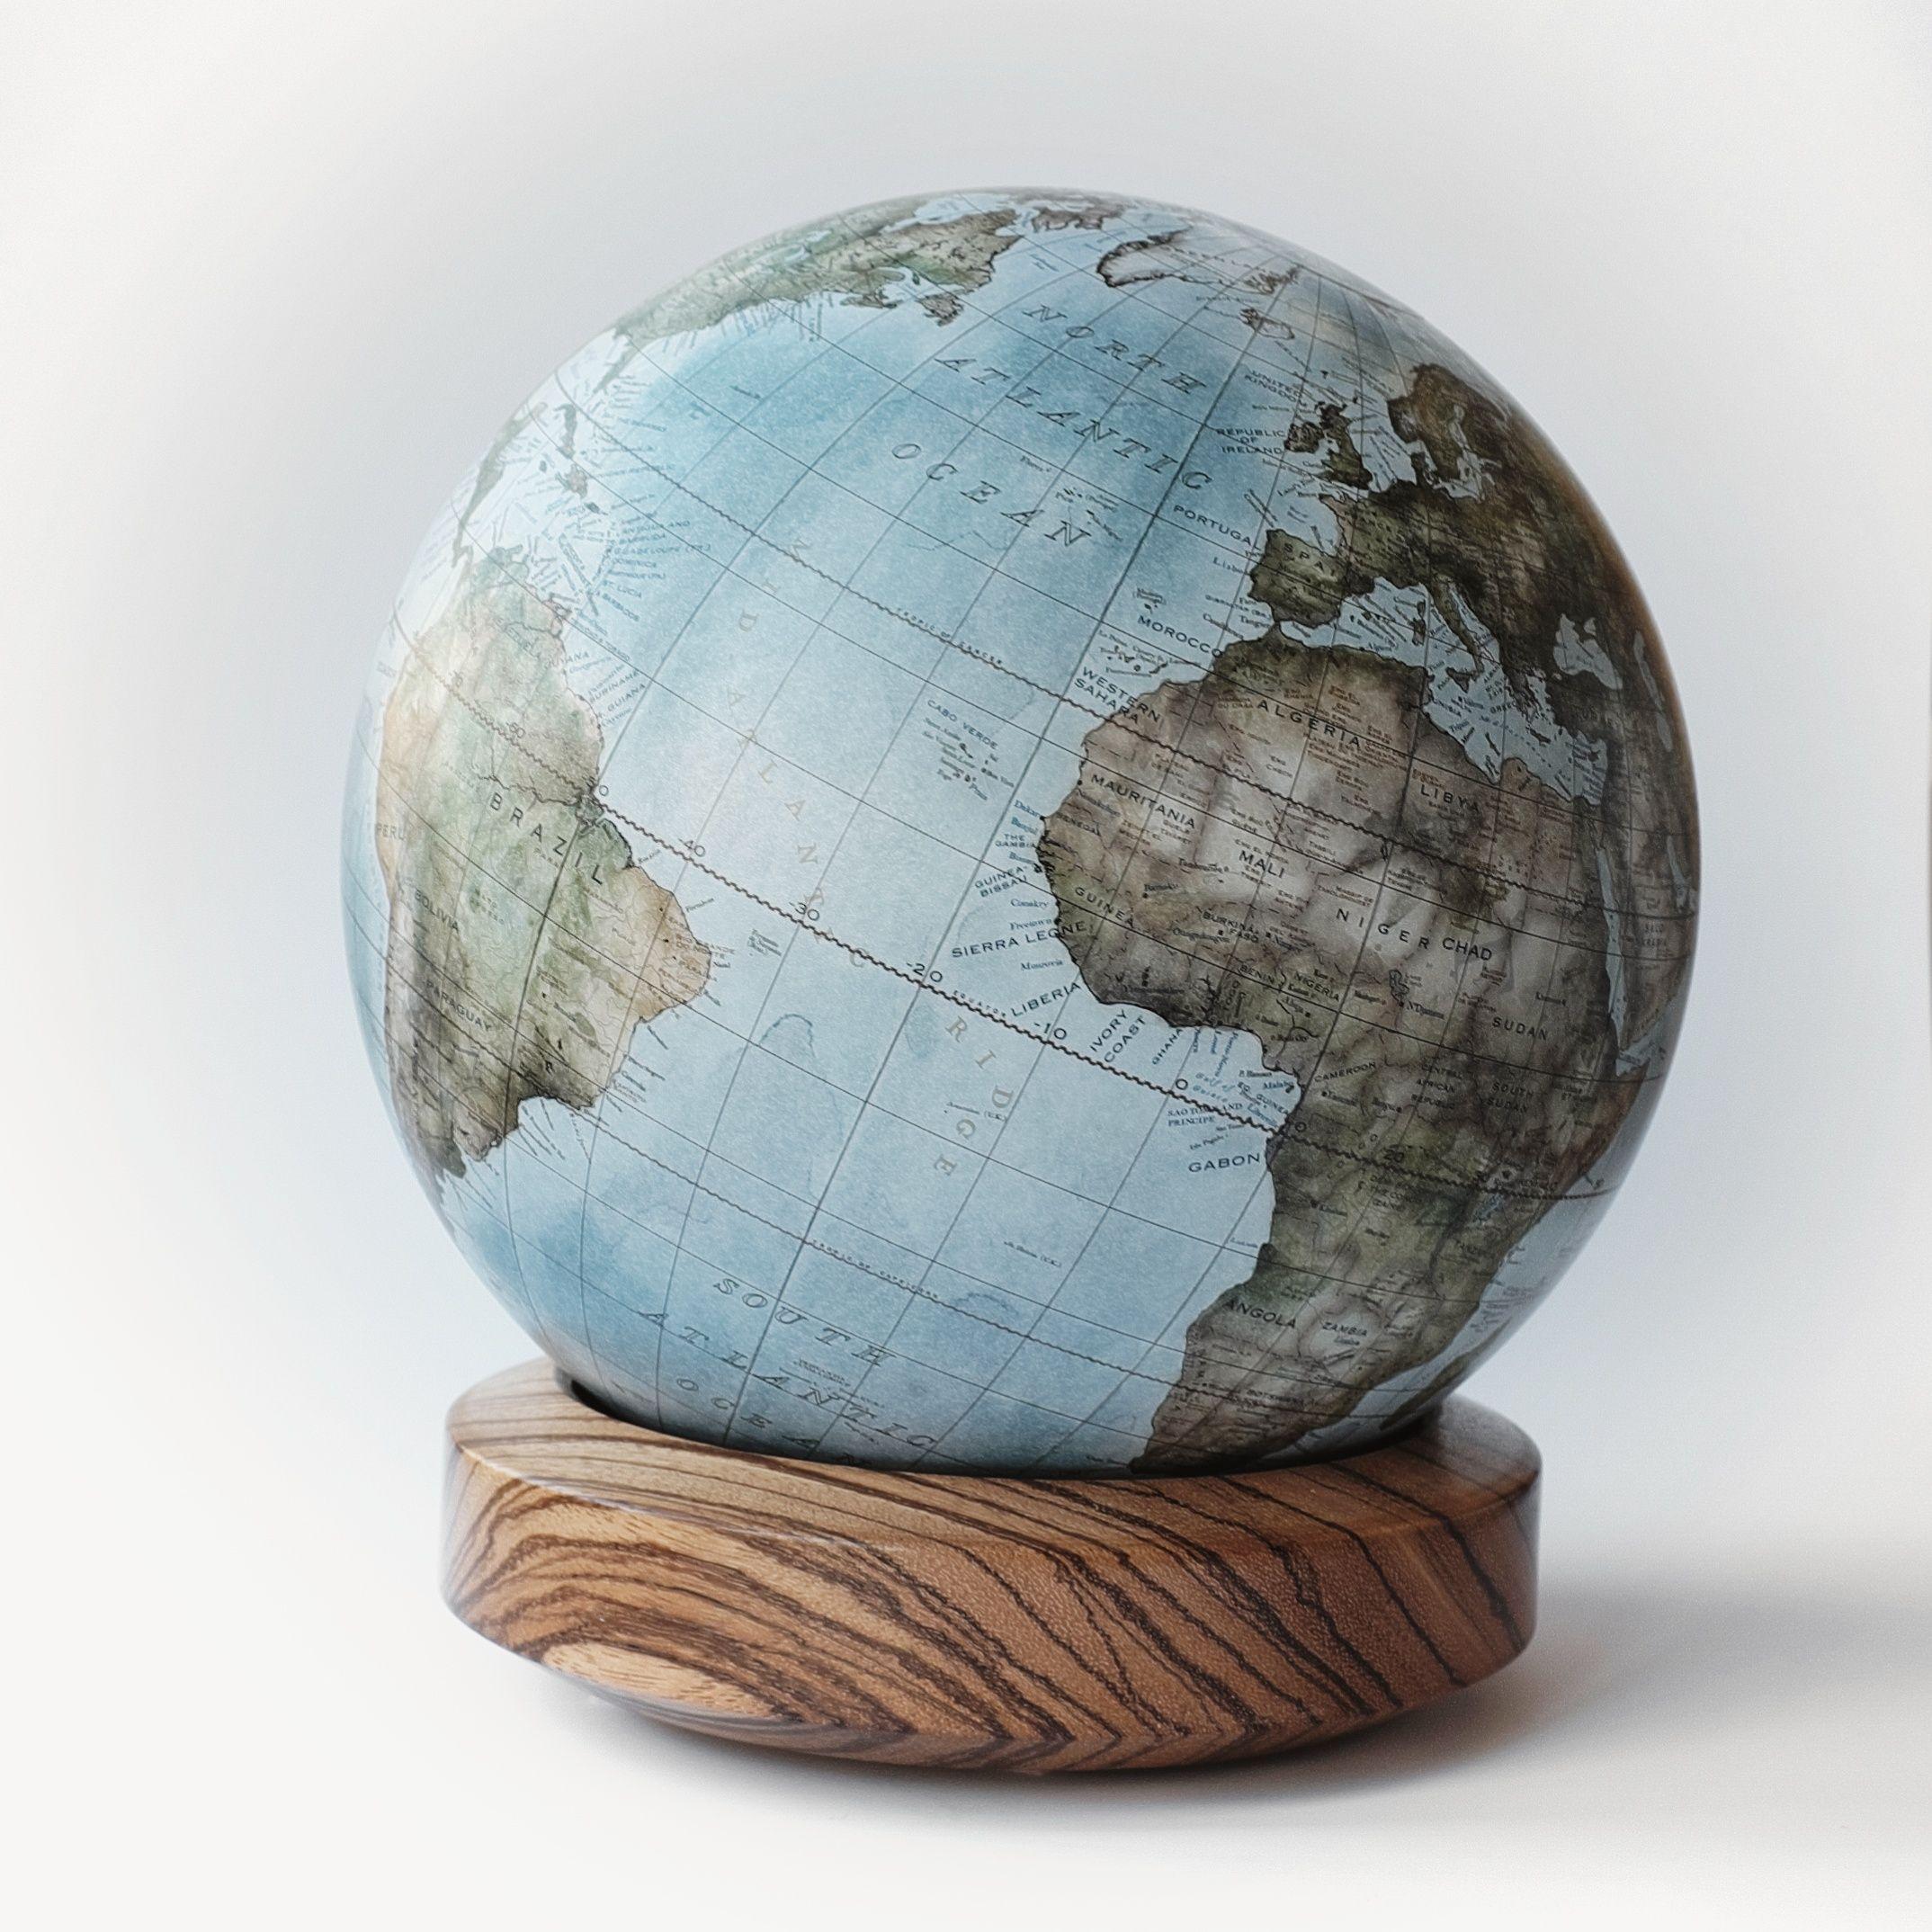 "Bellerby & Co Globemakers Handmade & Bespoke Modern World Globes. Terrestrial Desk Globe ""Gagarin"" on Zebrano base."